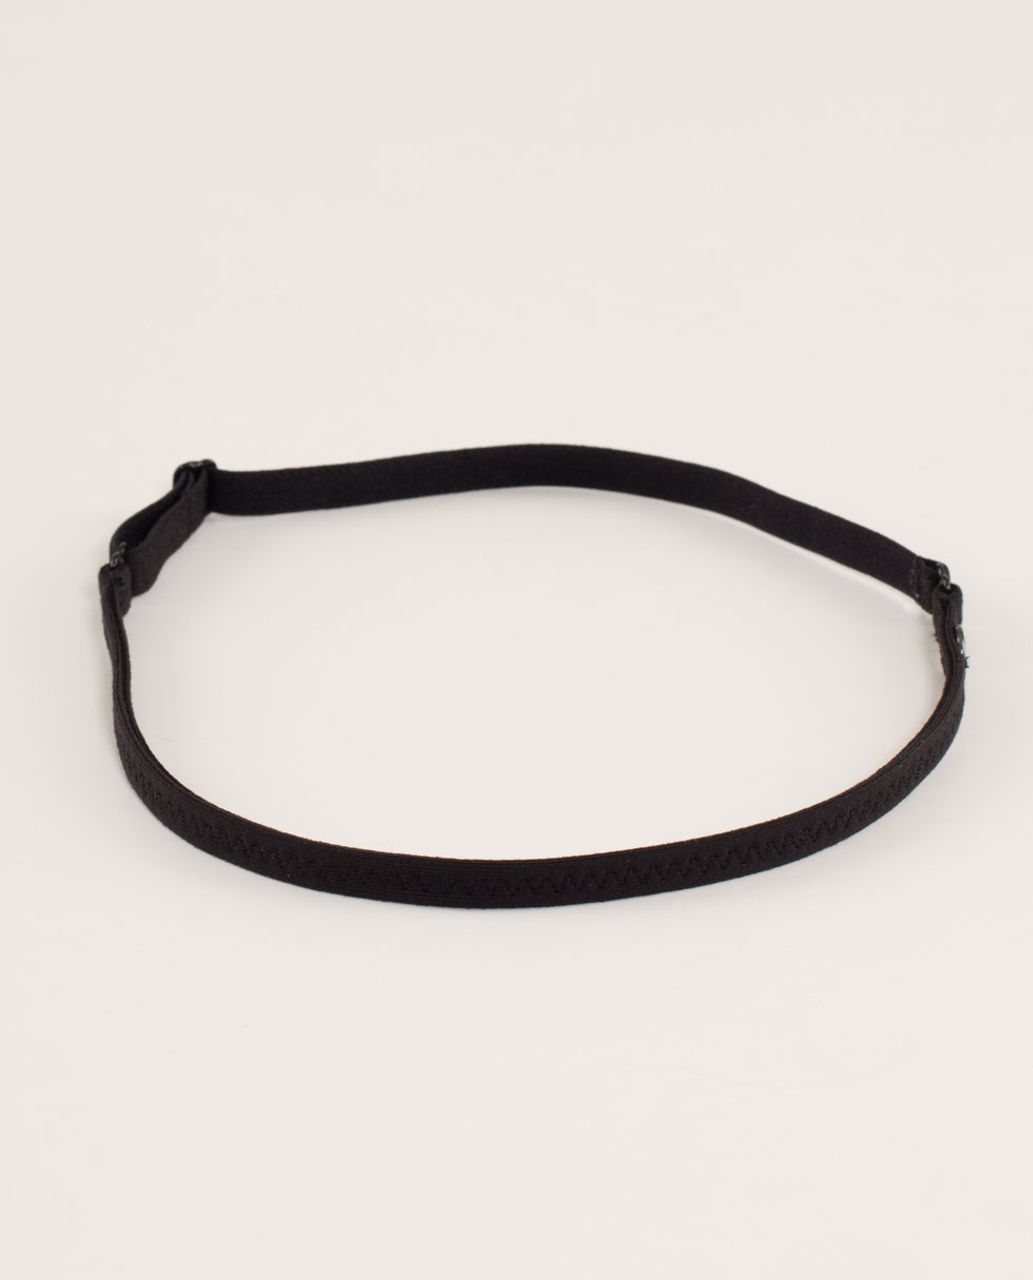 Lululemon Strappy Headband - Black